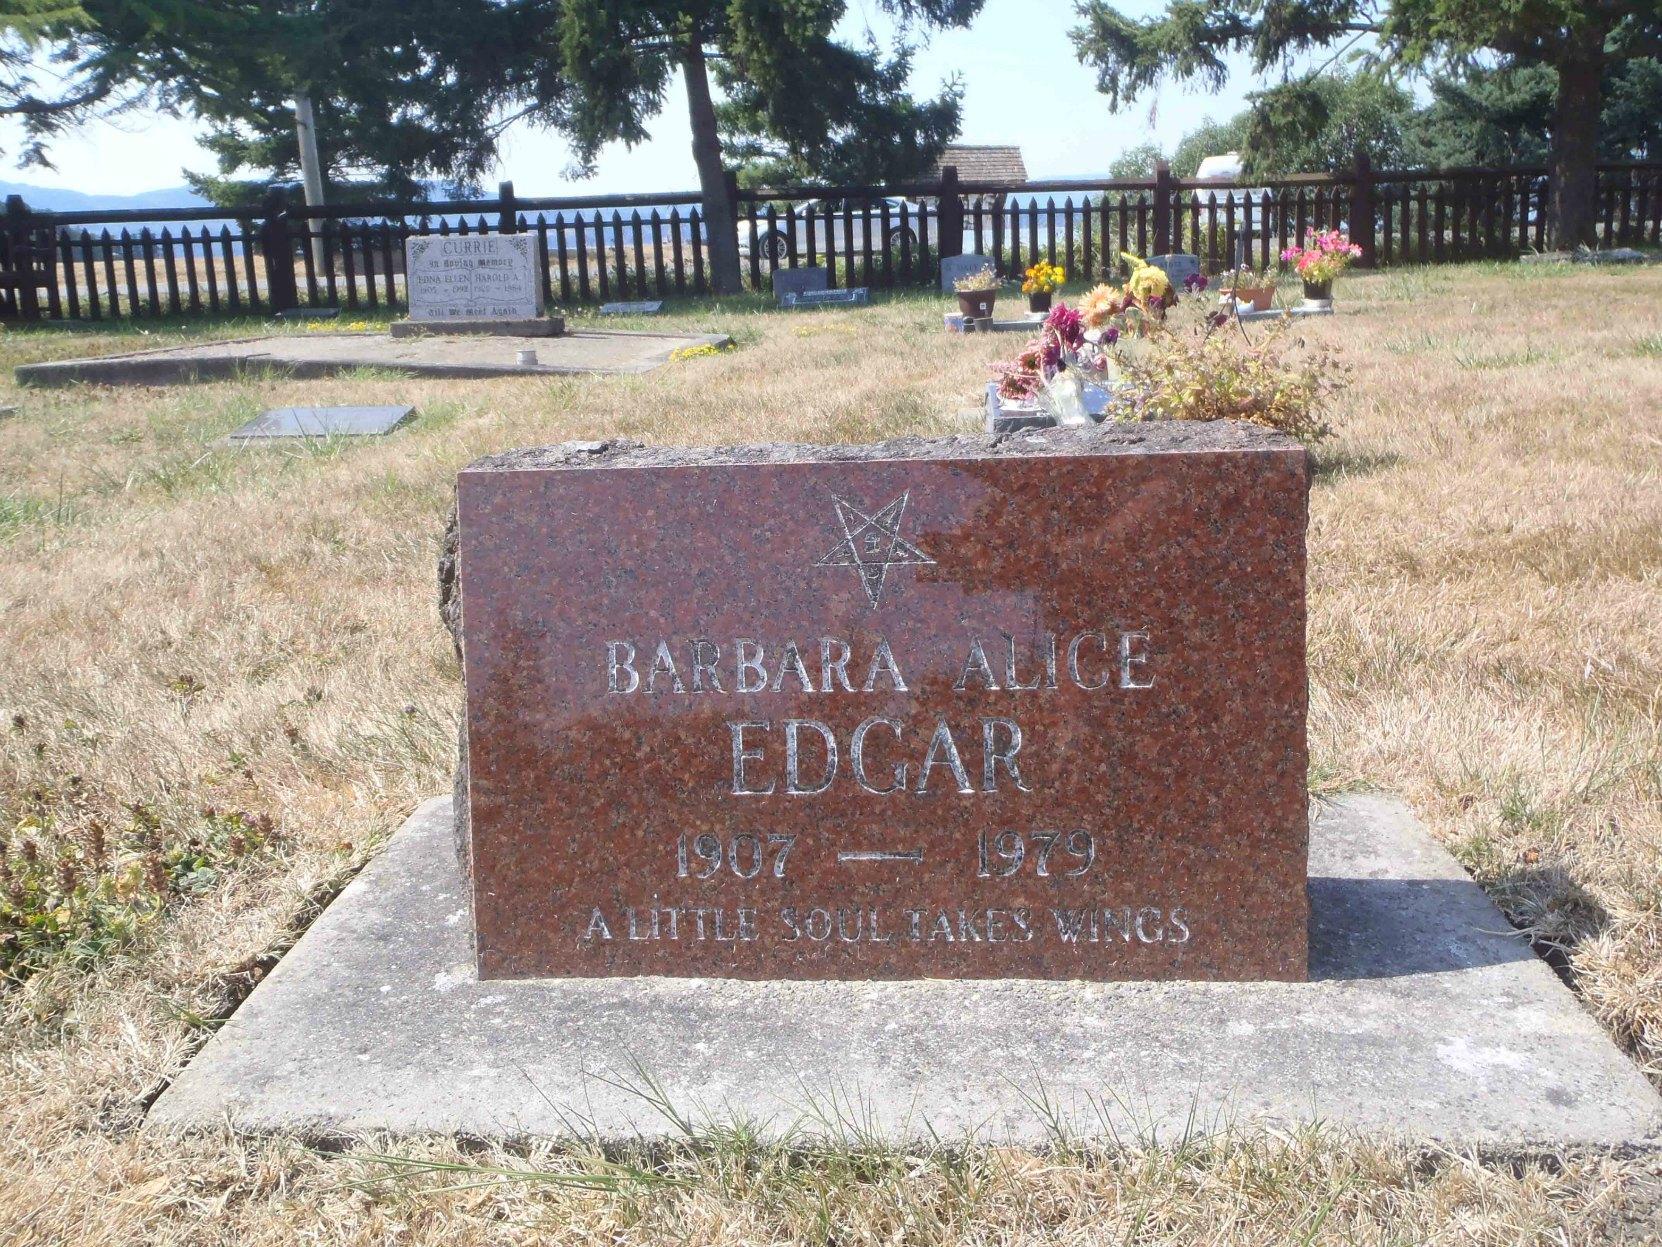 Barbara Alice Edgar grave marker, Holy Trinity Anglican cemetery, North Saanich, B.C.